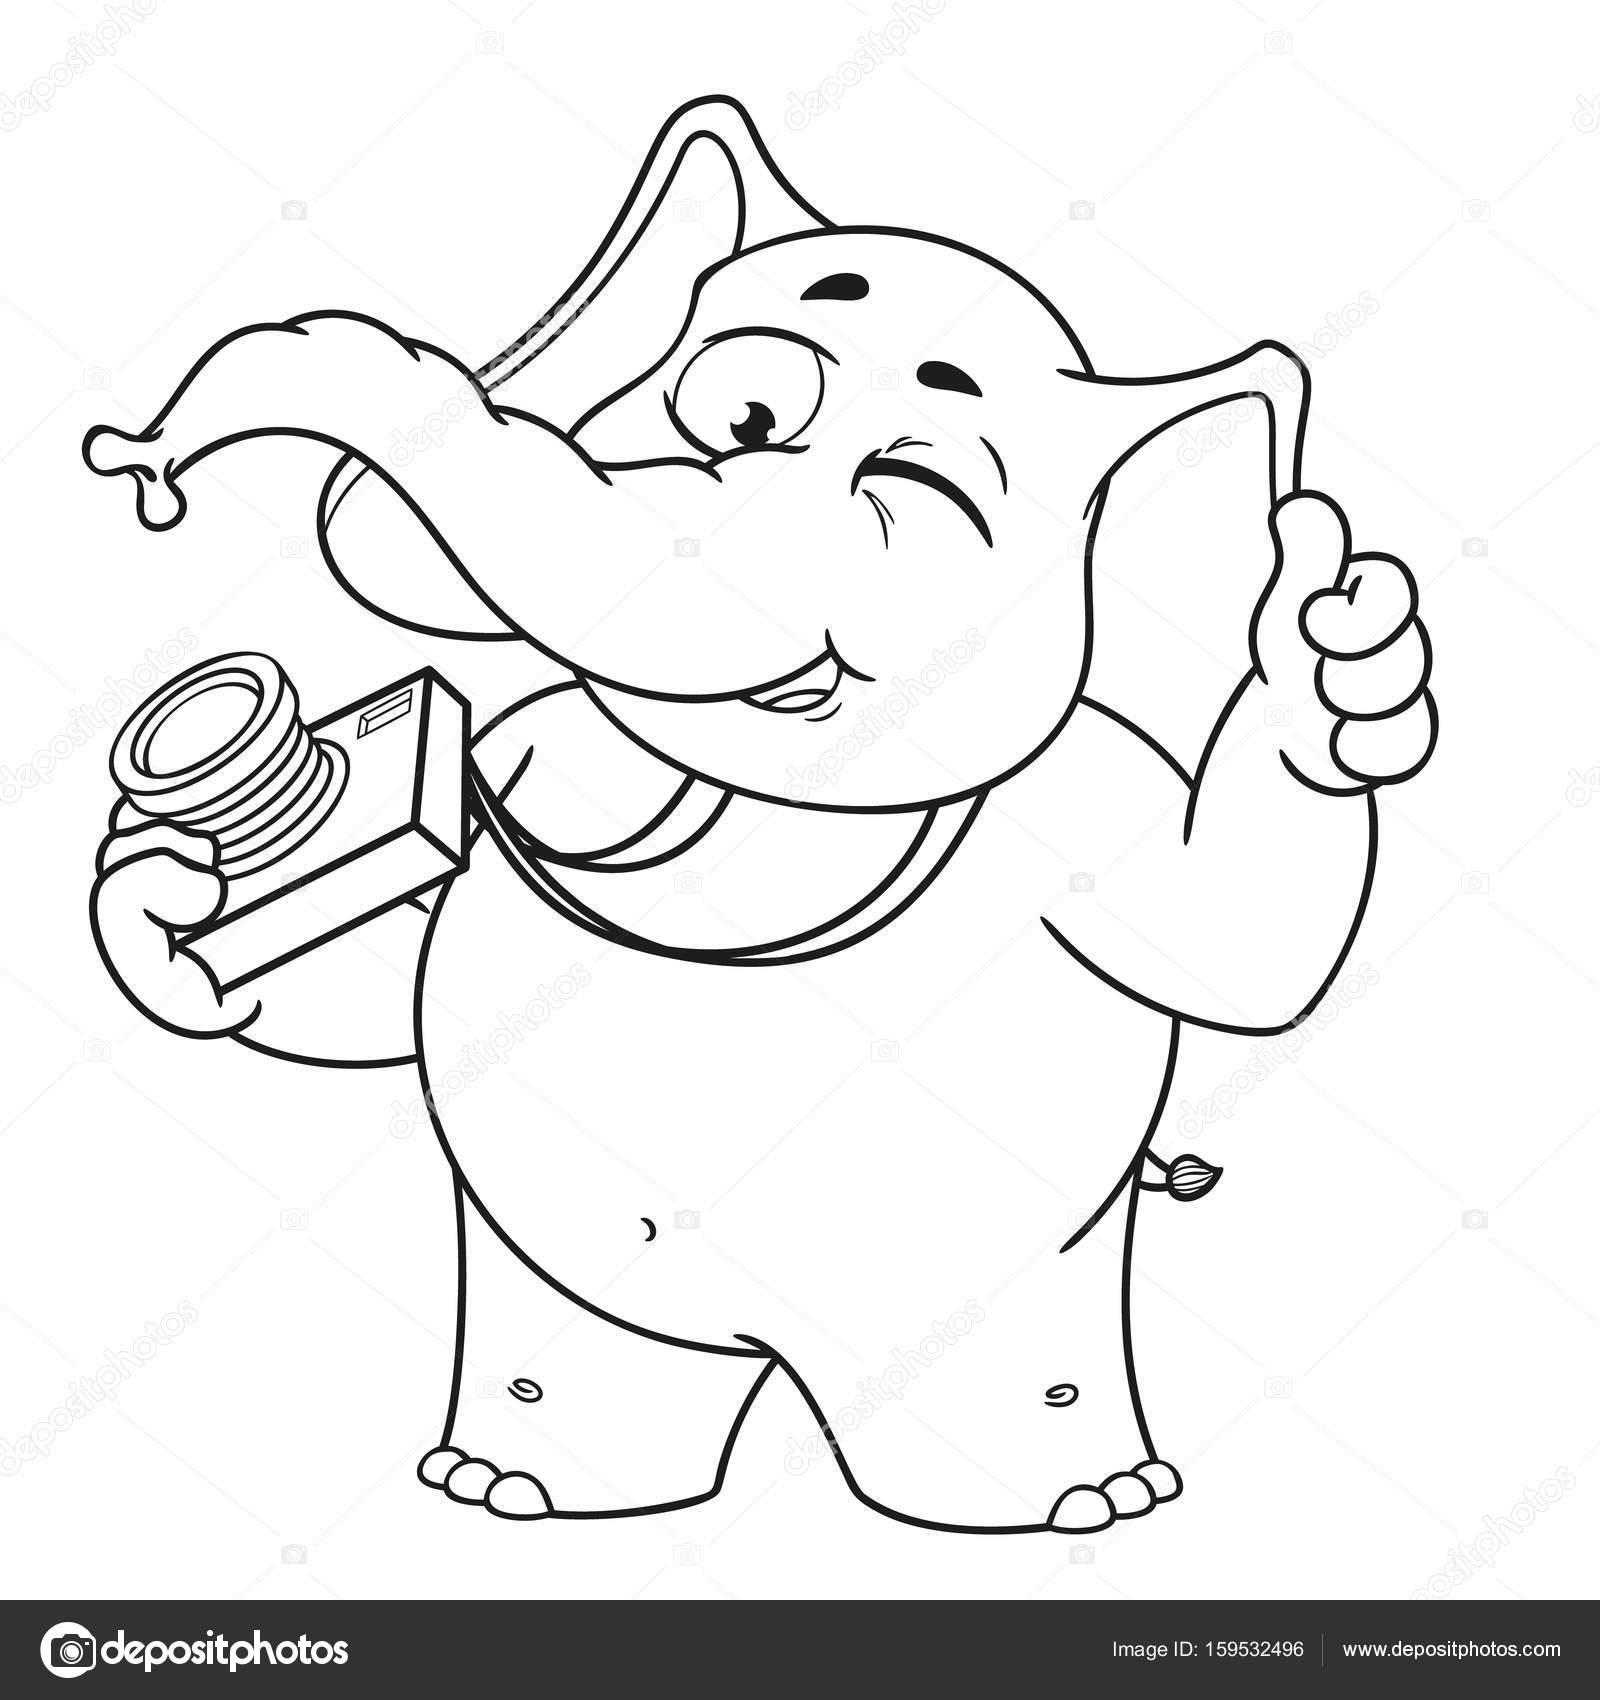 Animado Elefante Fotografo Personajes De Dibujos Animados De